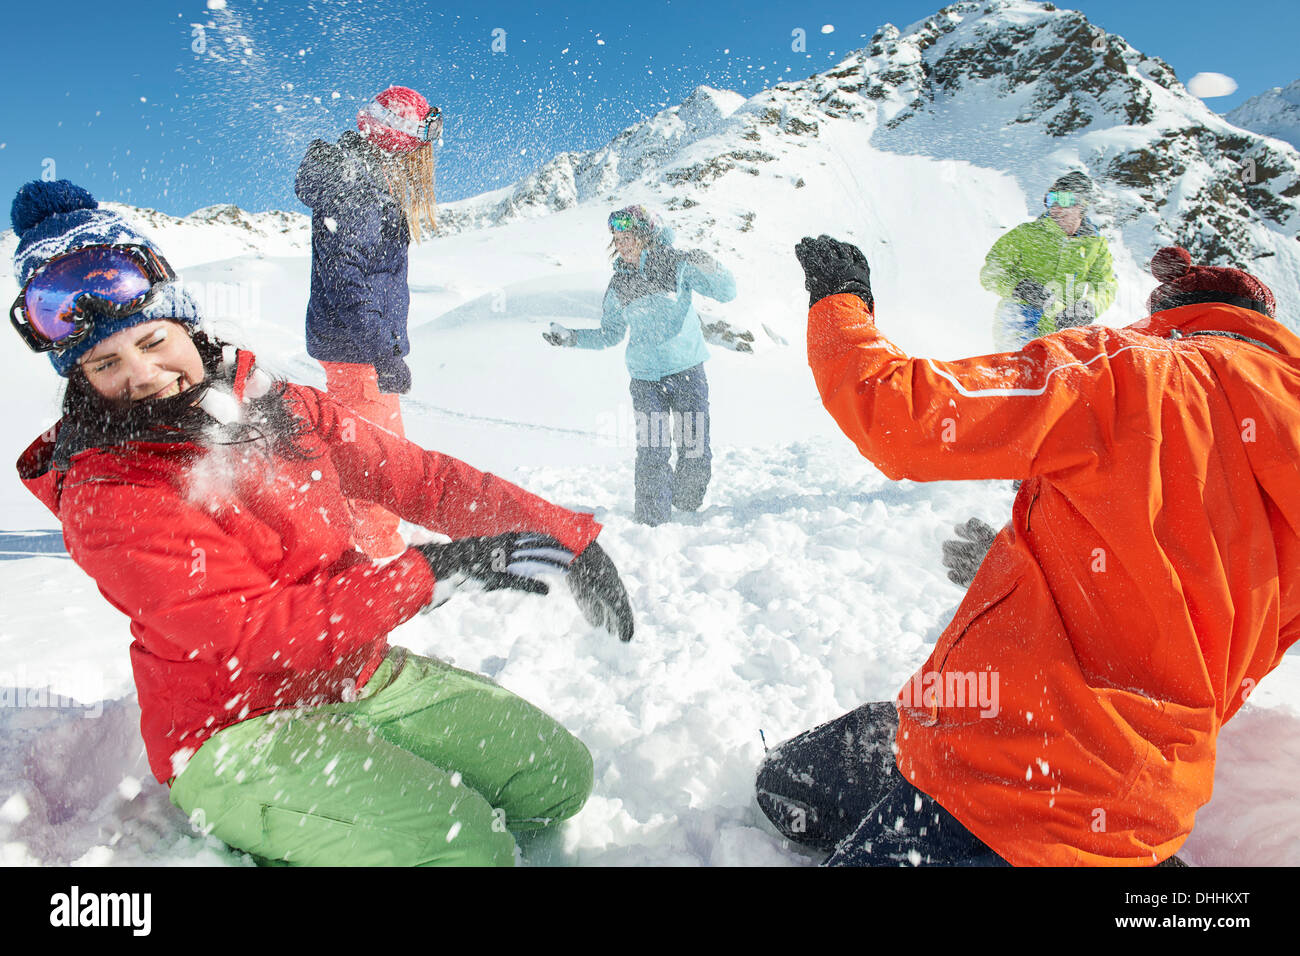 Friends having snowball fight, Kuhtai, Austria - Stock Image